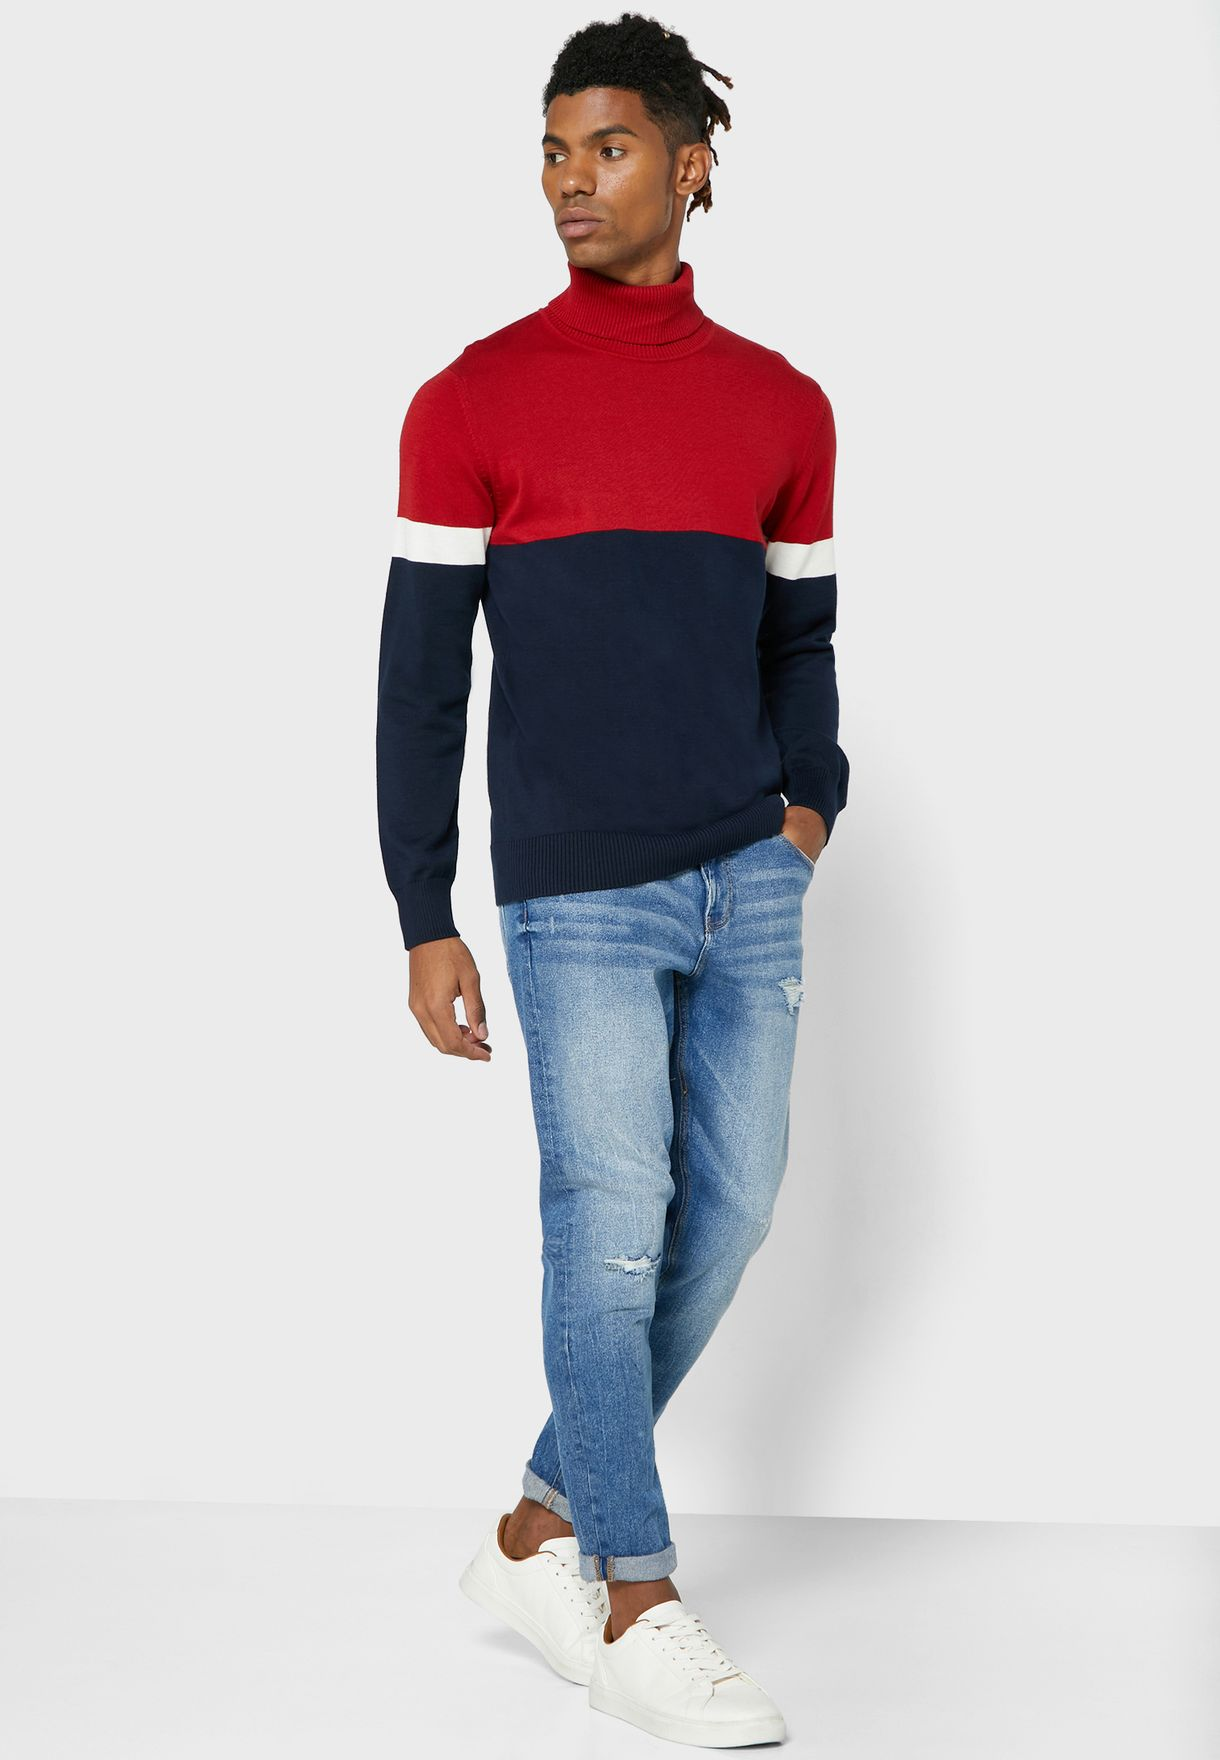 Colourblock Knit